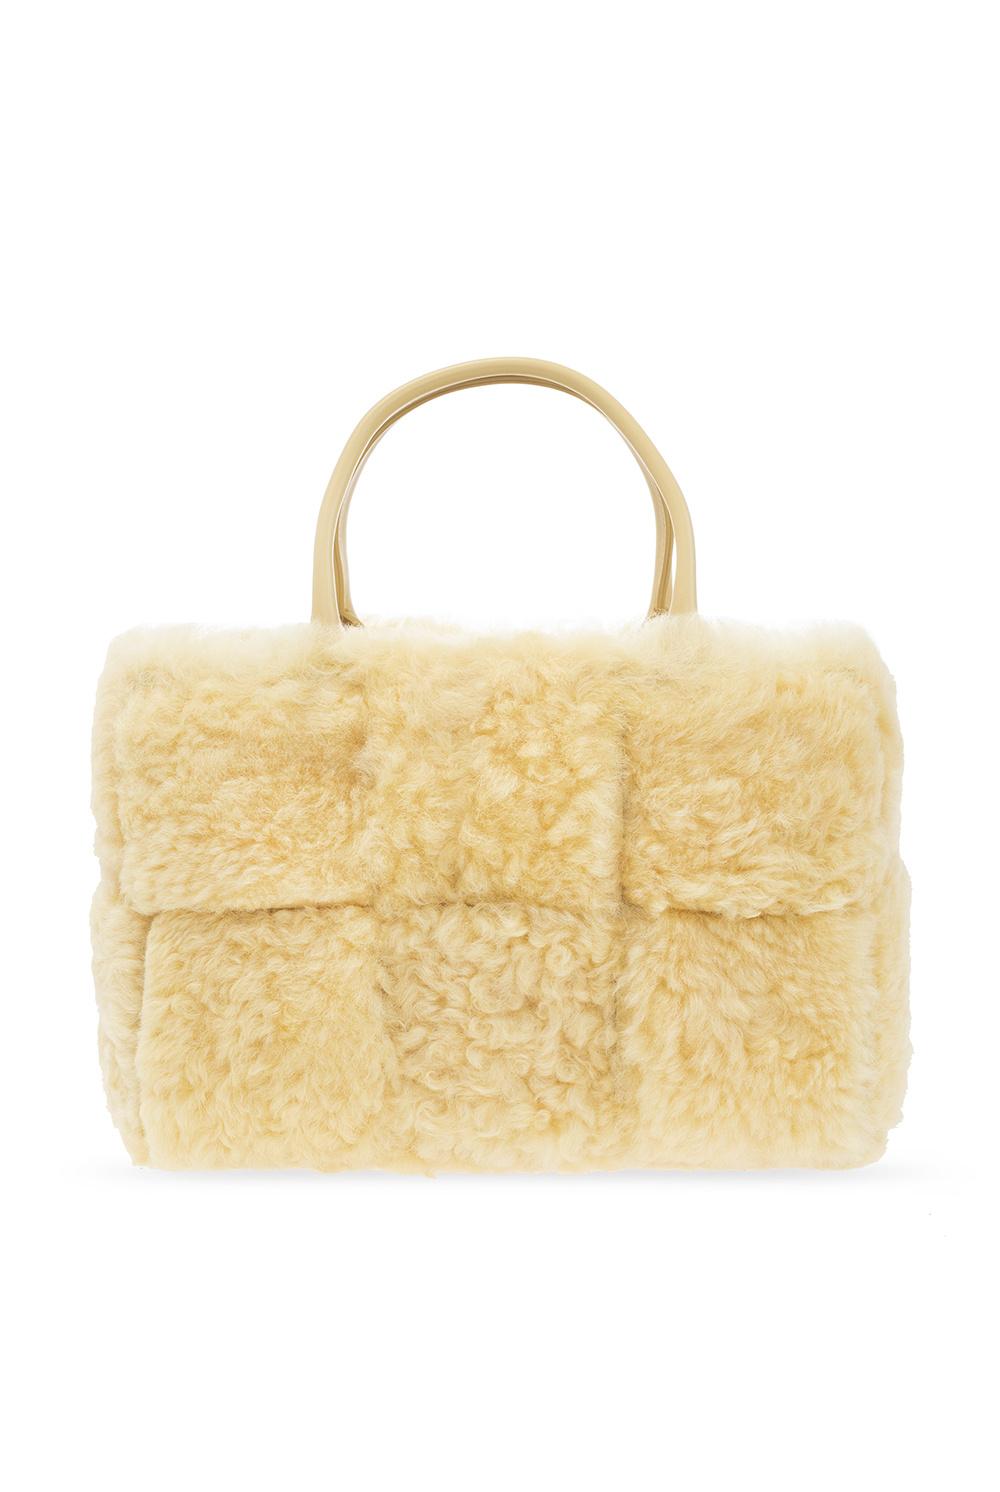 Bottega Veneta 'Arco Tote Small' hand bag